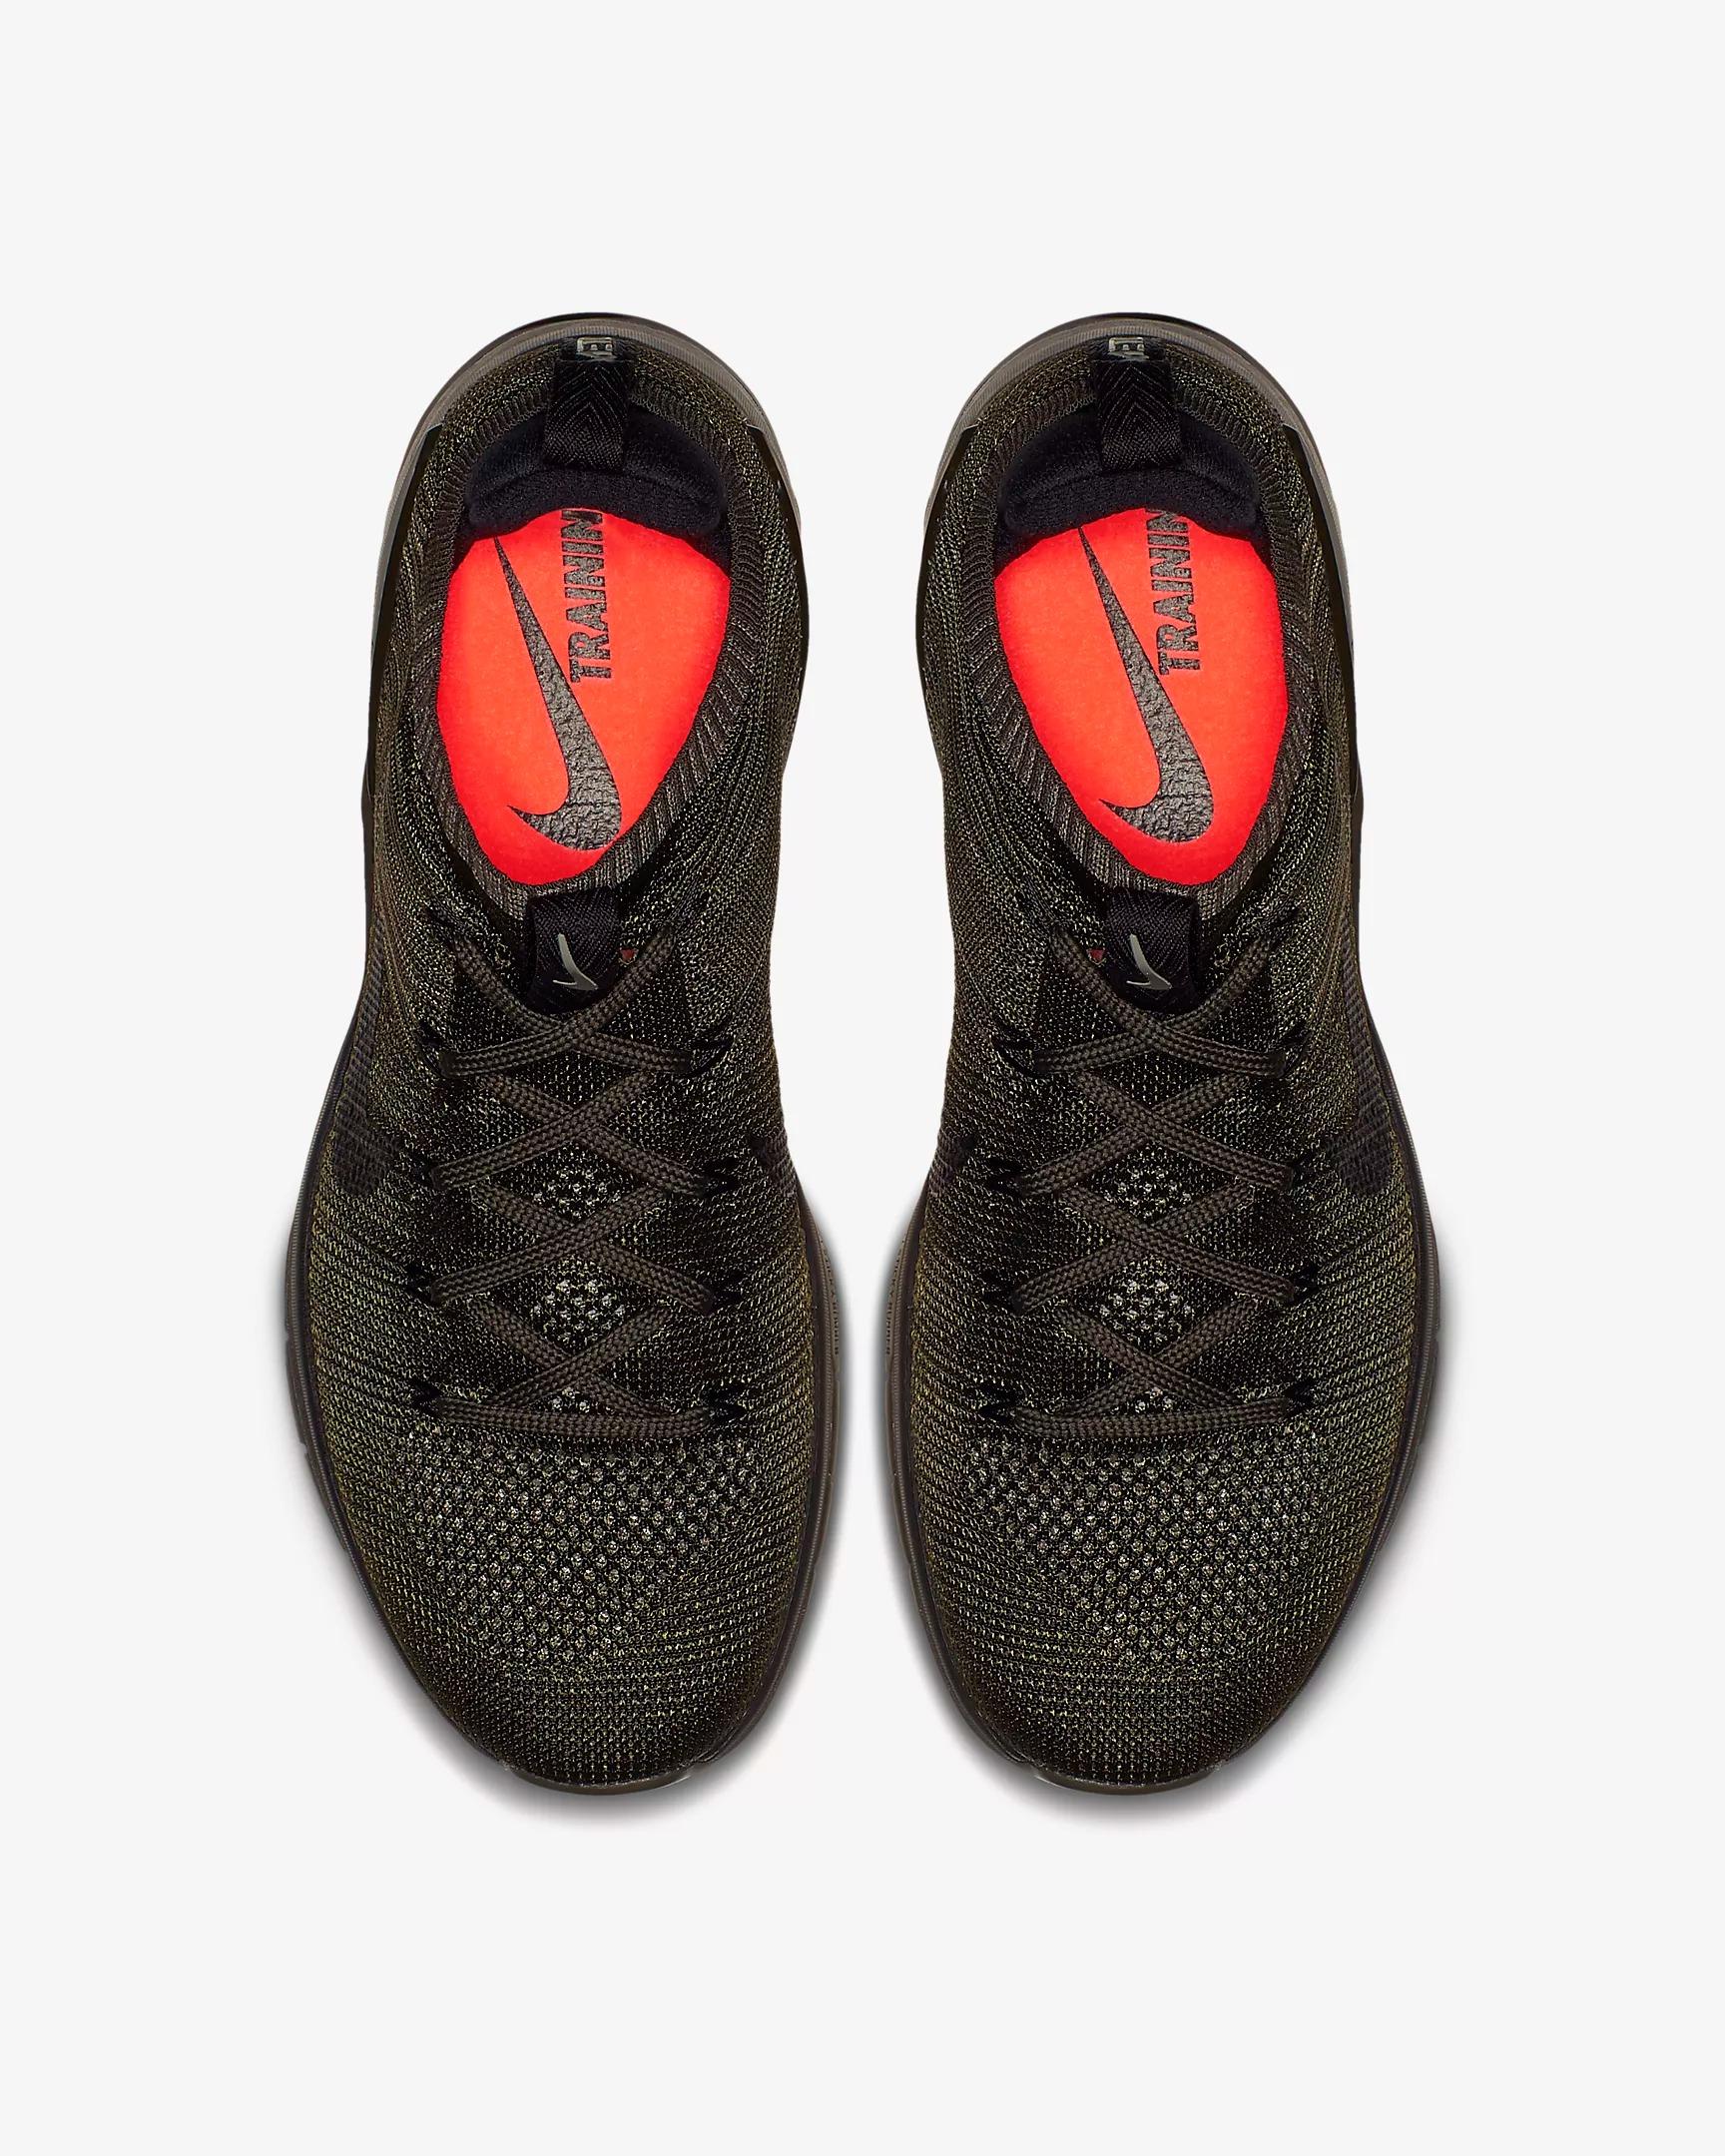 c35420f86190 Nike Metcon DSX Flyknit 2 Training Shoes - SPORT SHOES TRAINING ...